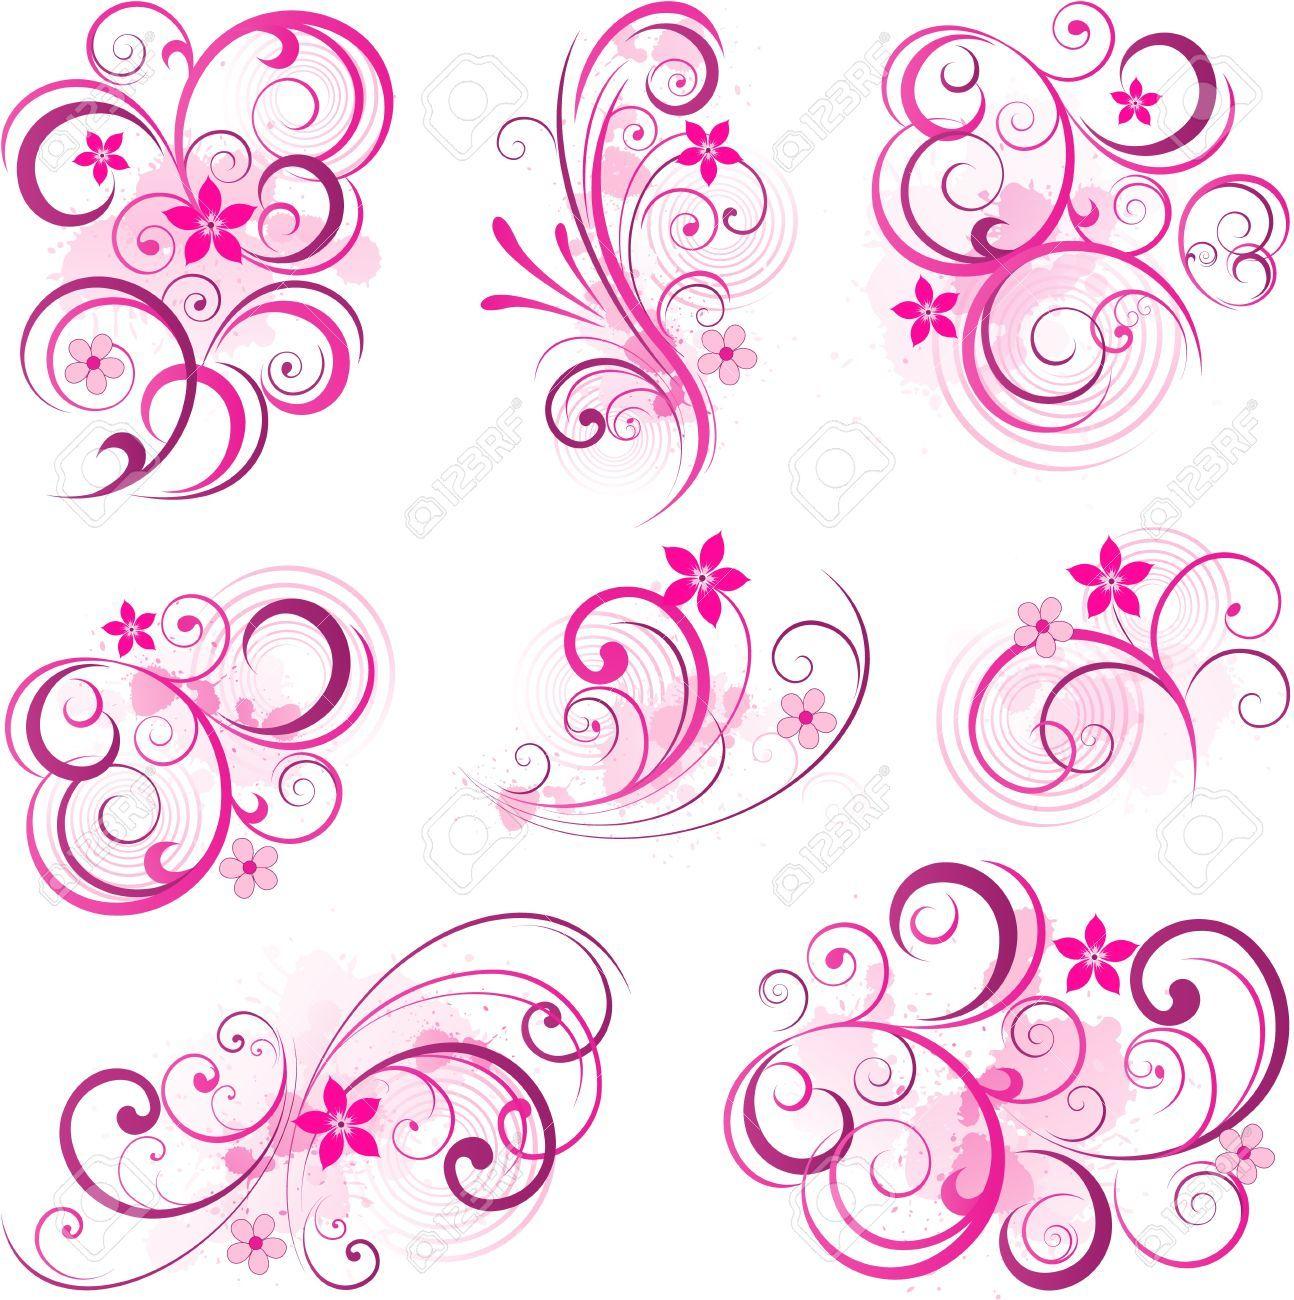 Pink scroll clipart » Clipart Portal.